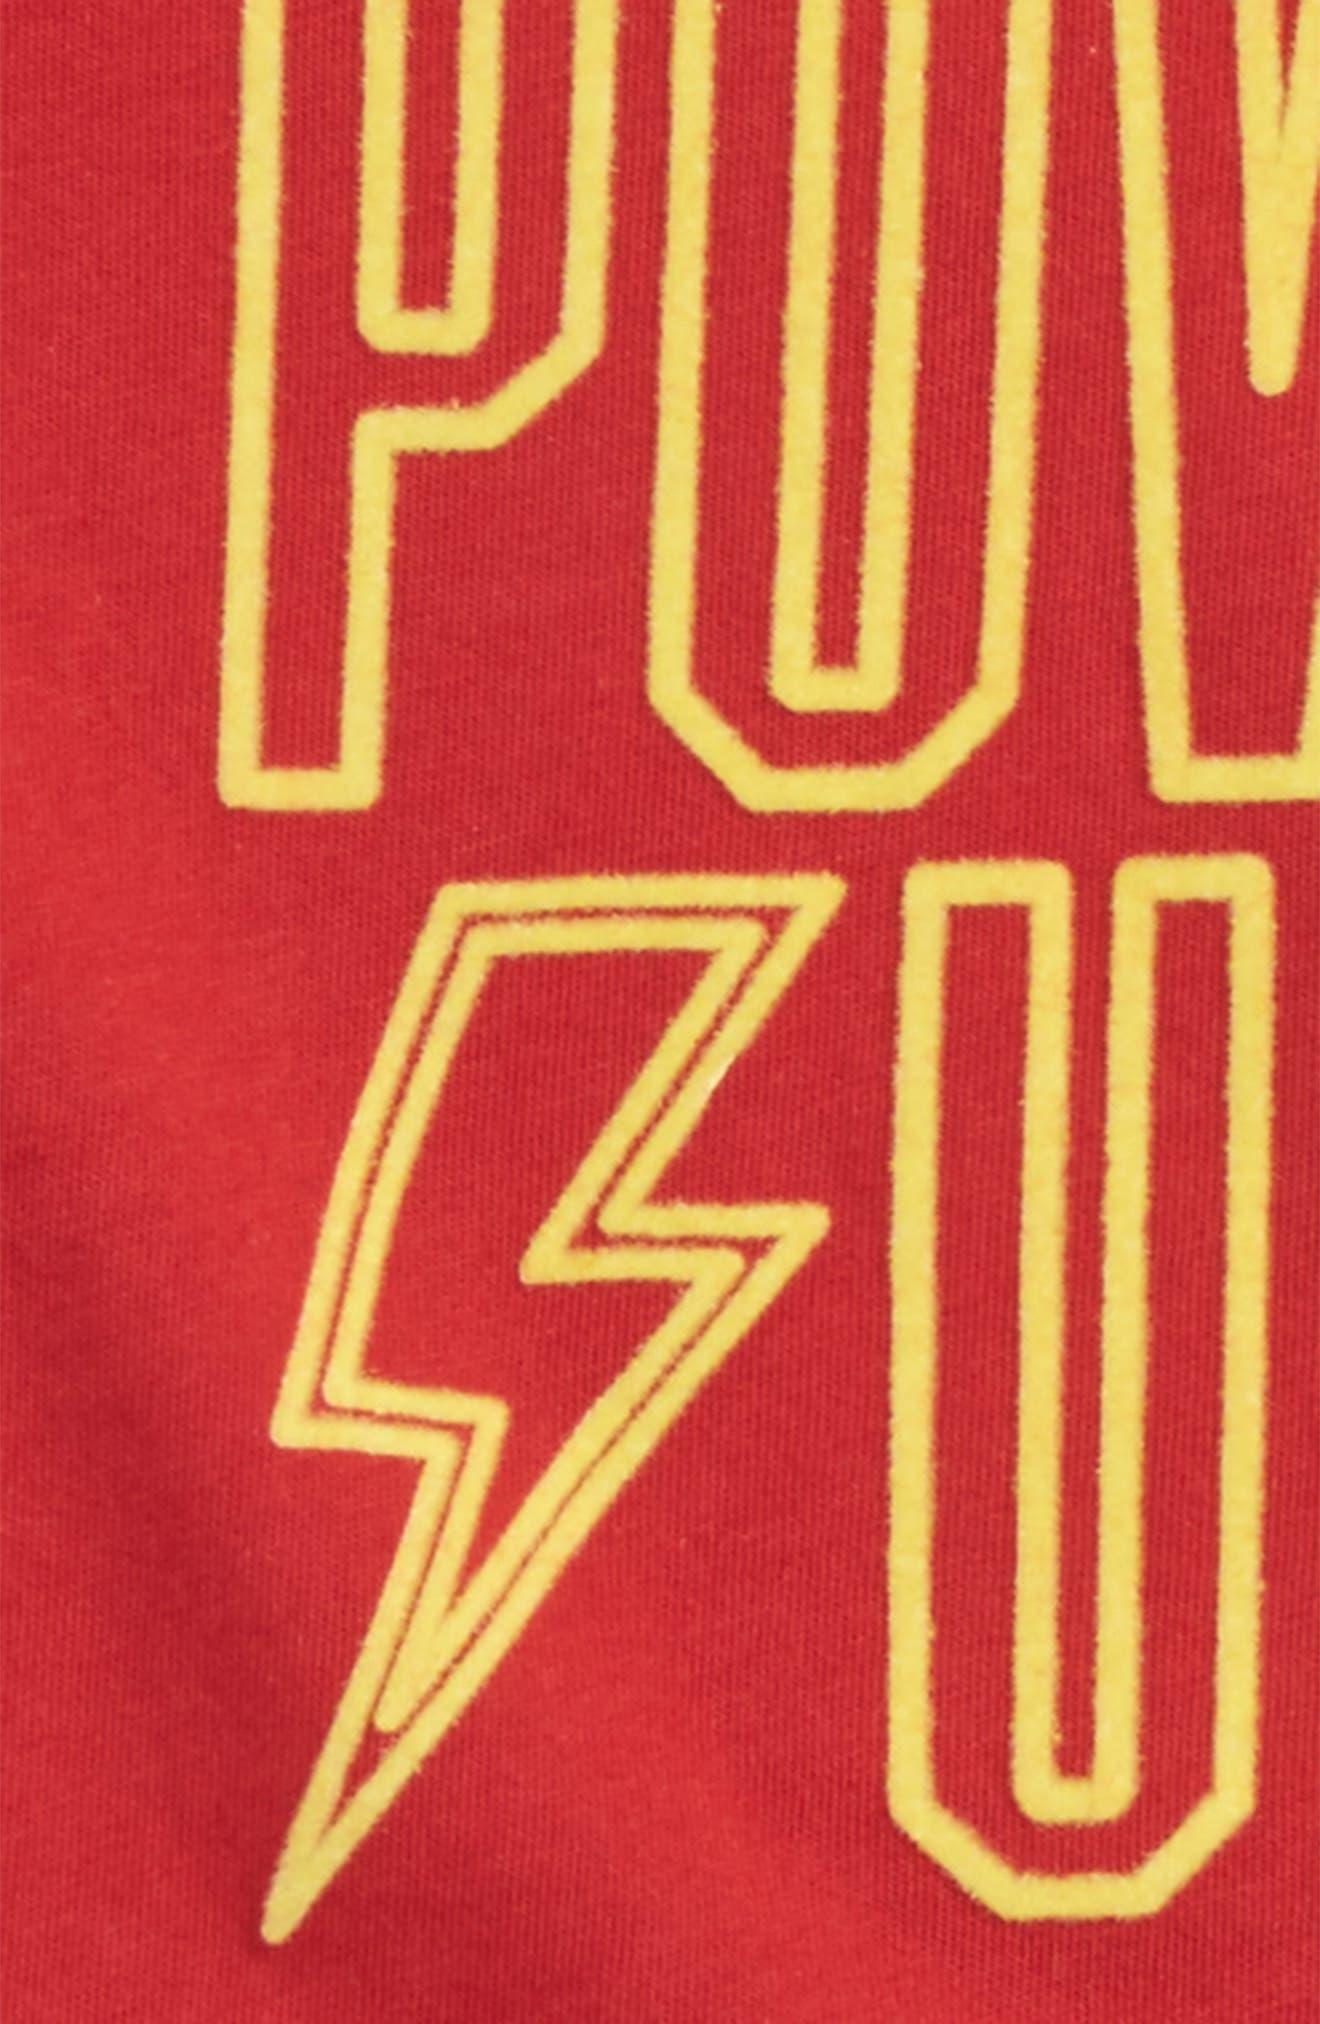 Alternate Image 2  - Peek Power Up T-Shirt (Baby Boys)